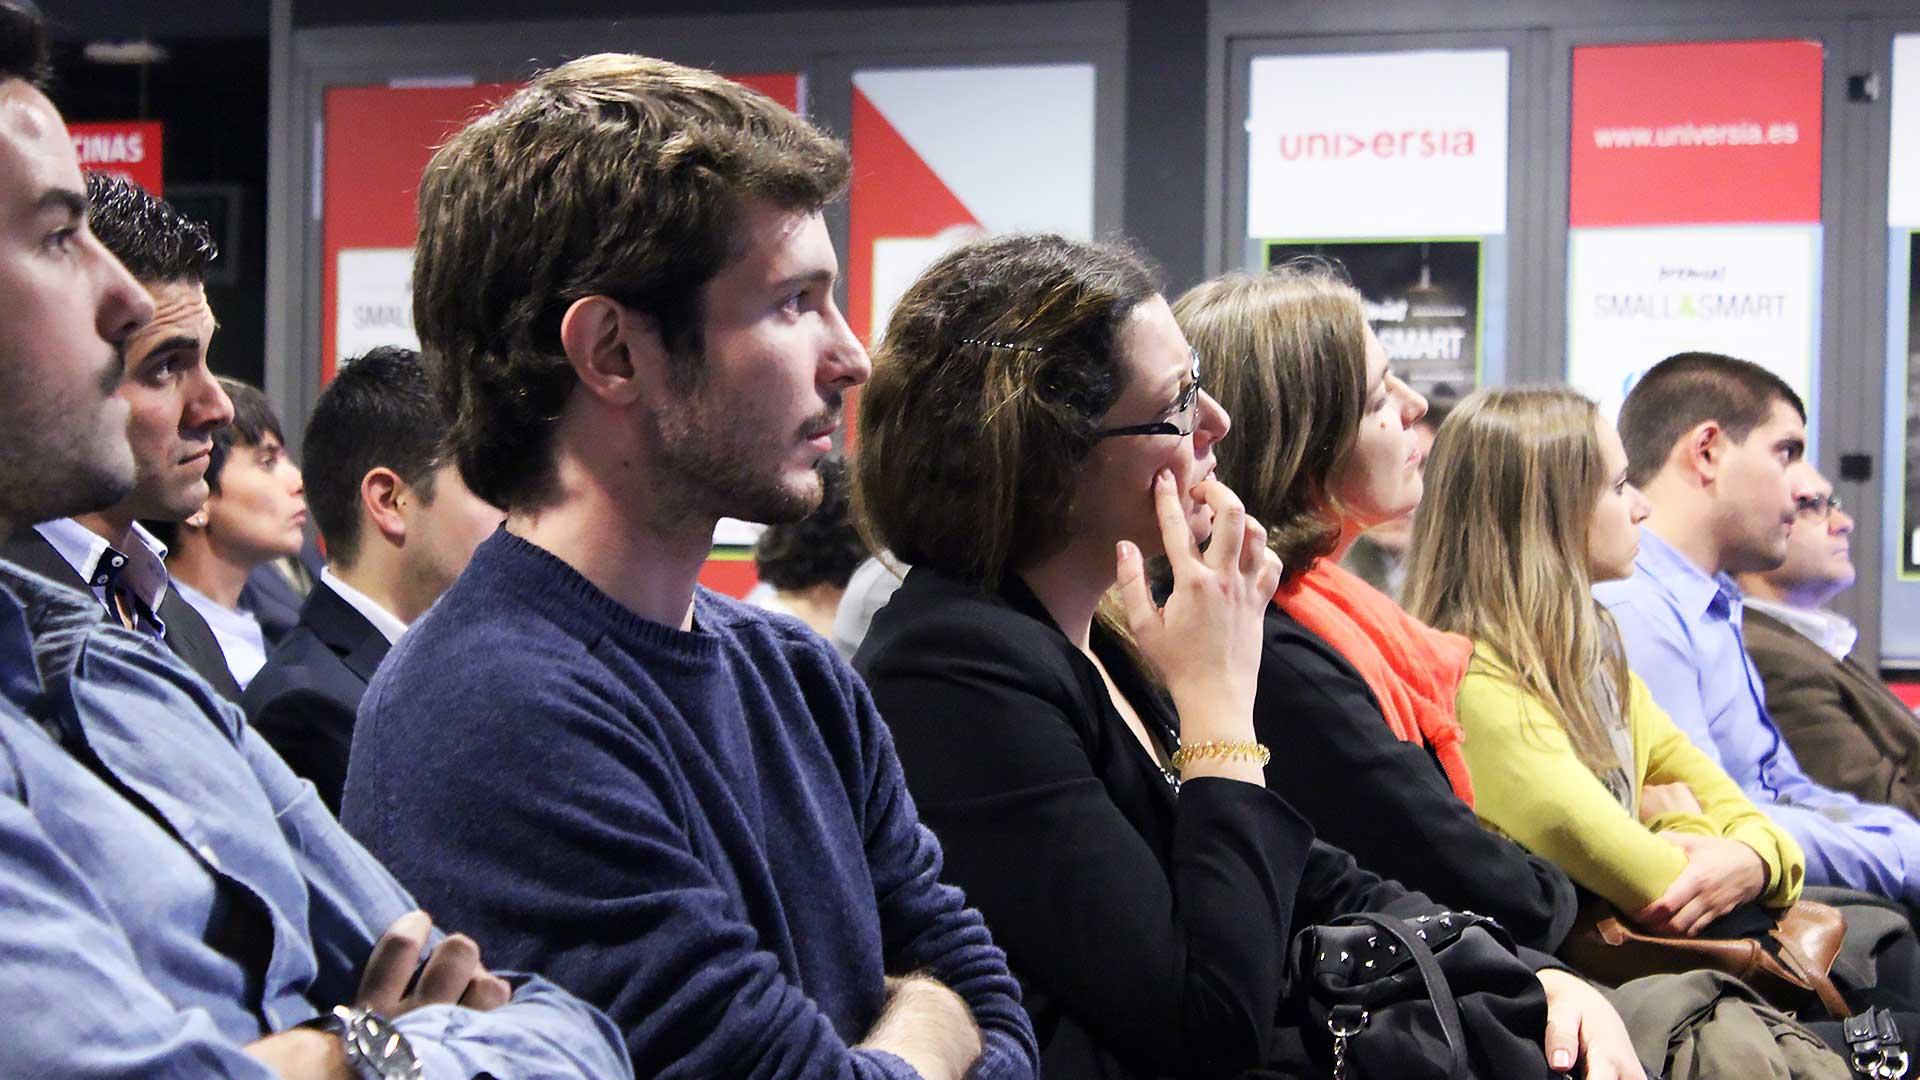 smallsmart-premios-startups-pymes-2015-publico-3